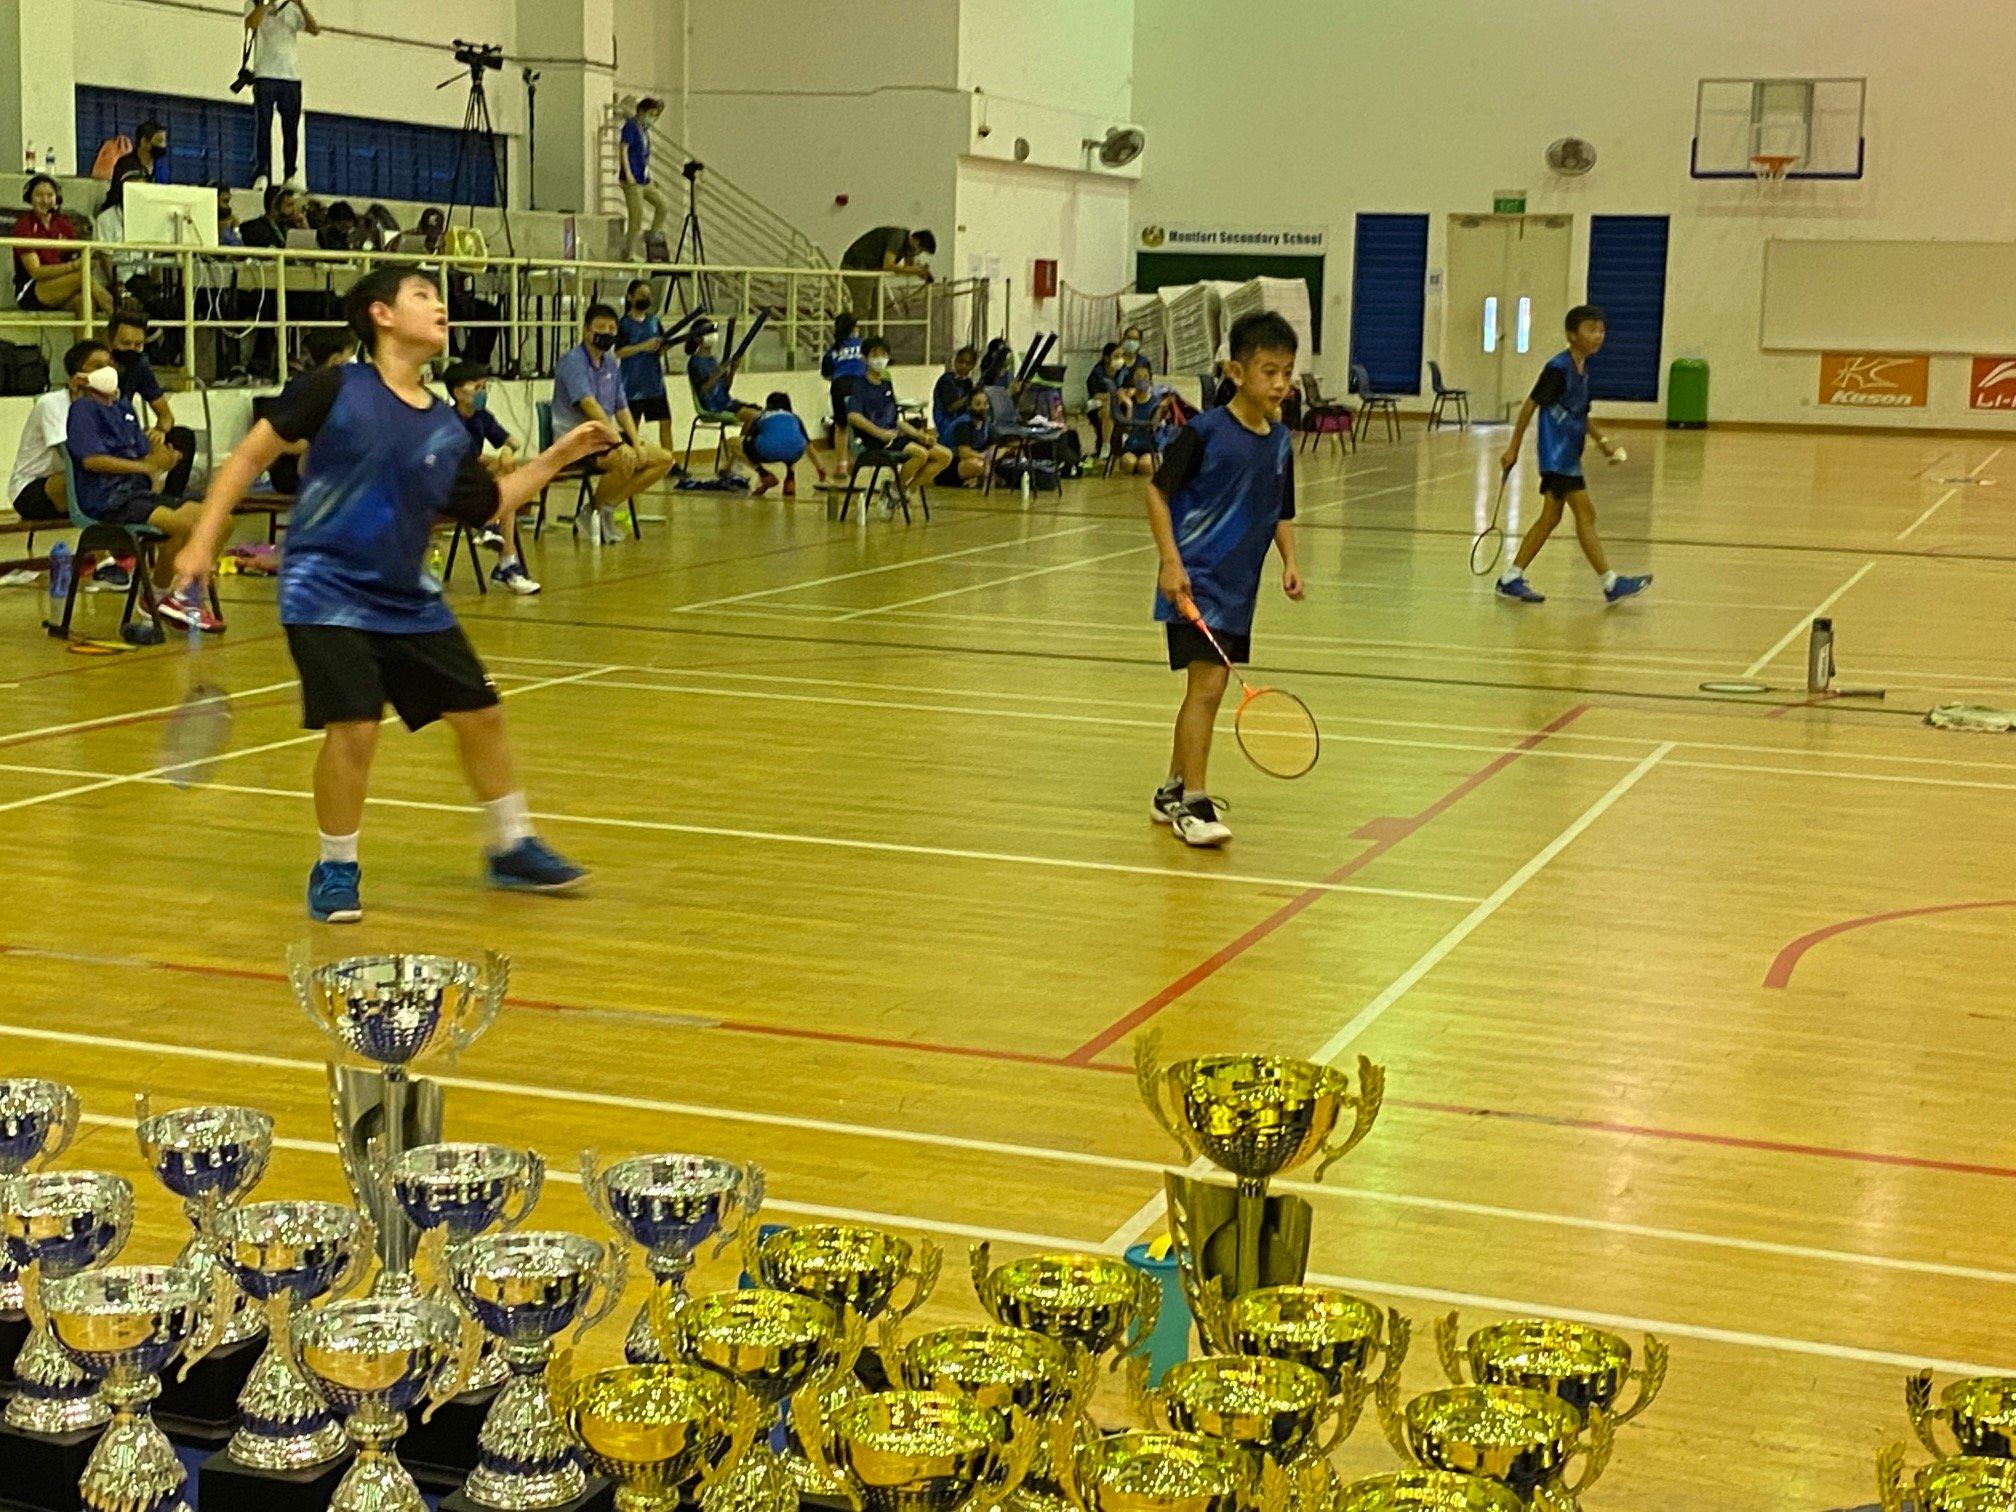 NSG Snr Div North Zone boys' badminton final - Rosyth second doubles-1